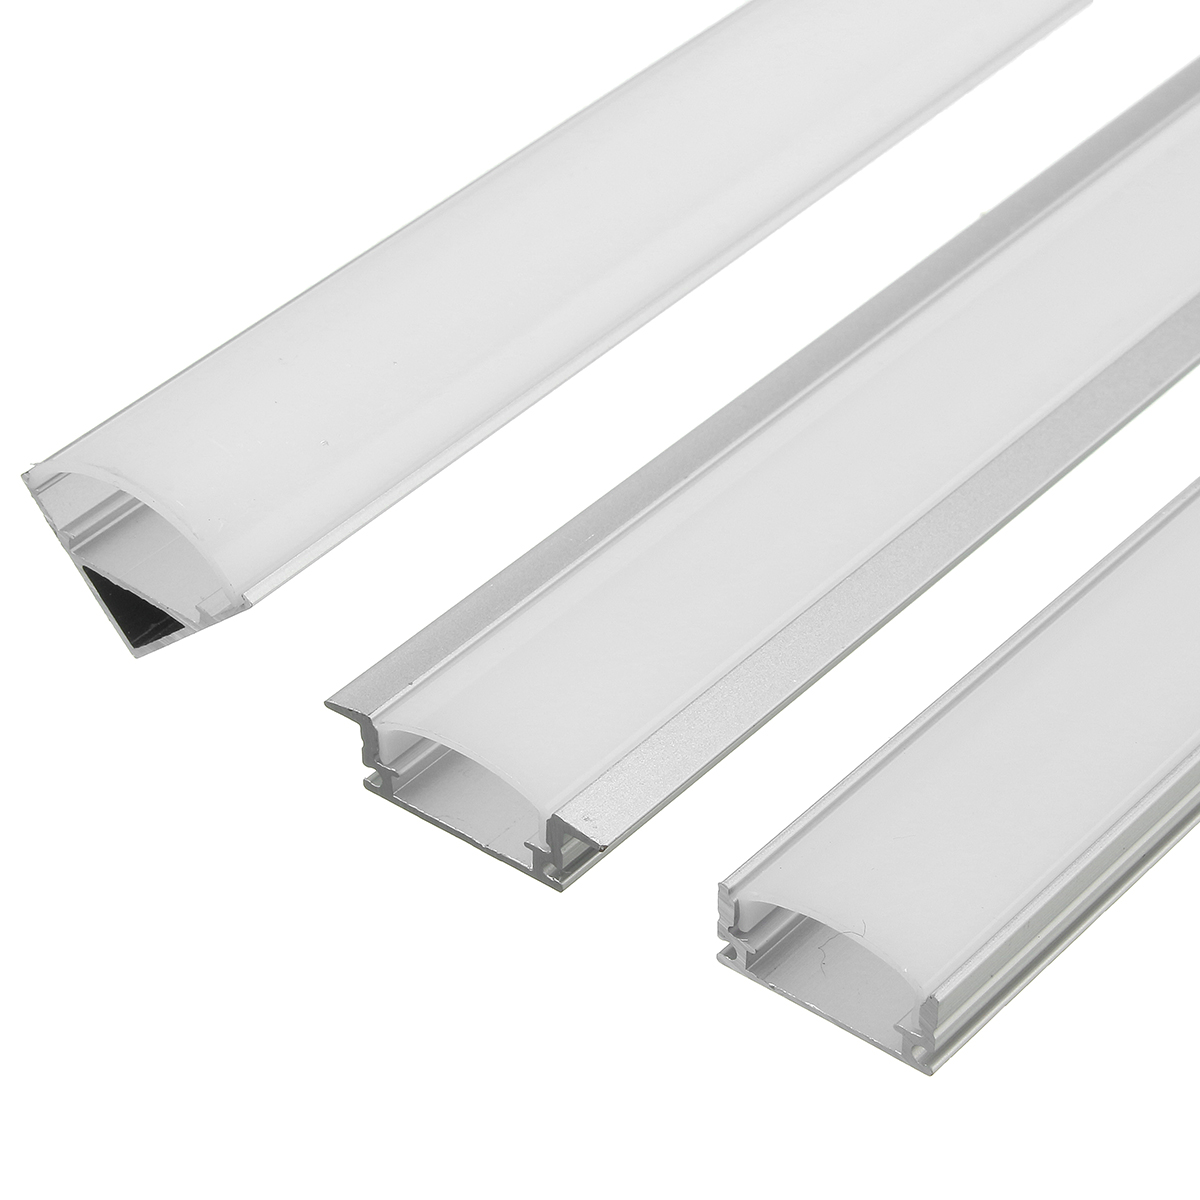 45cm U V Yw Style Aluminum Channel Holder For Led Rigid